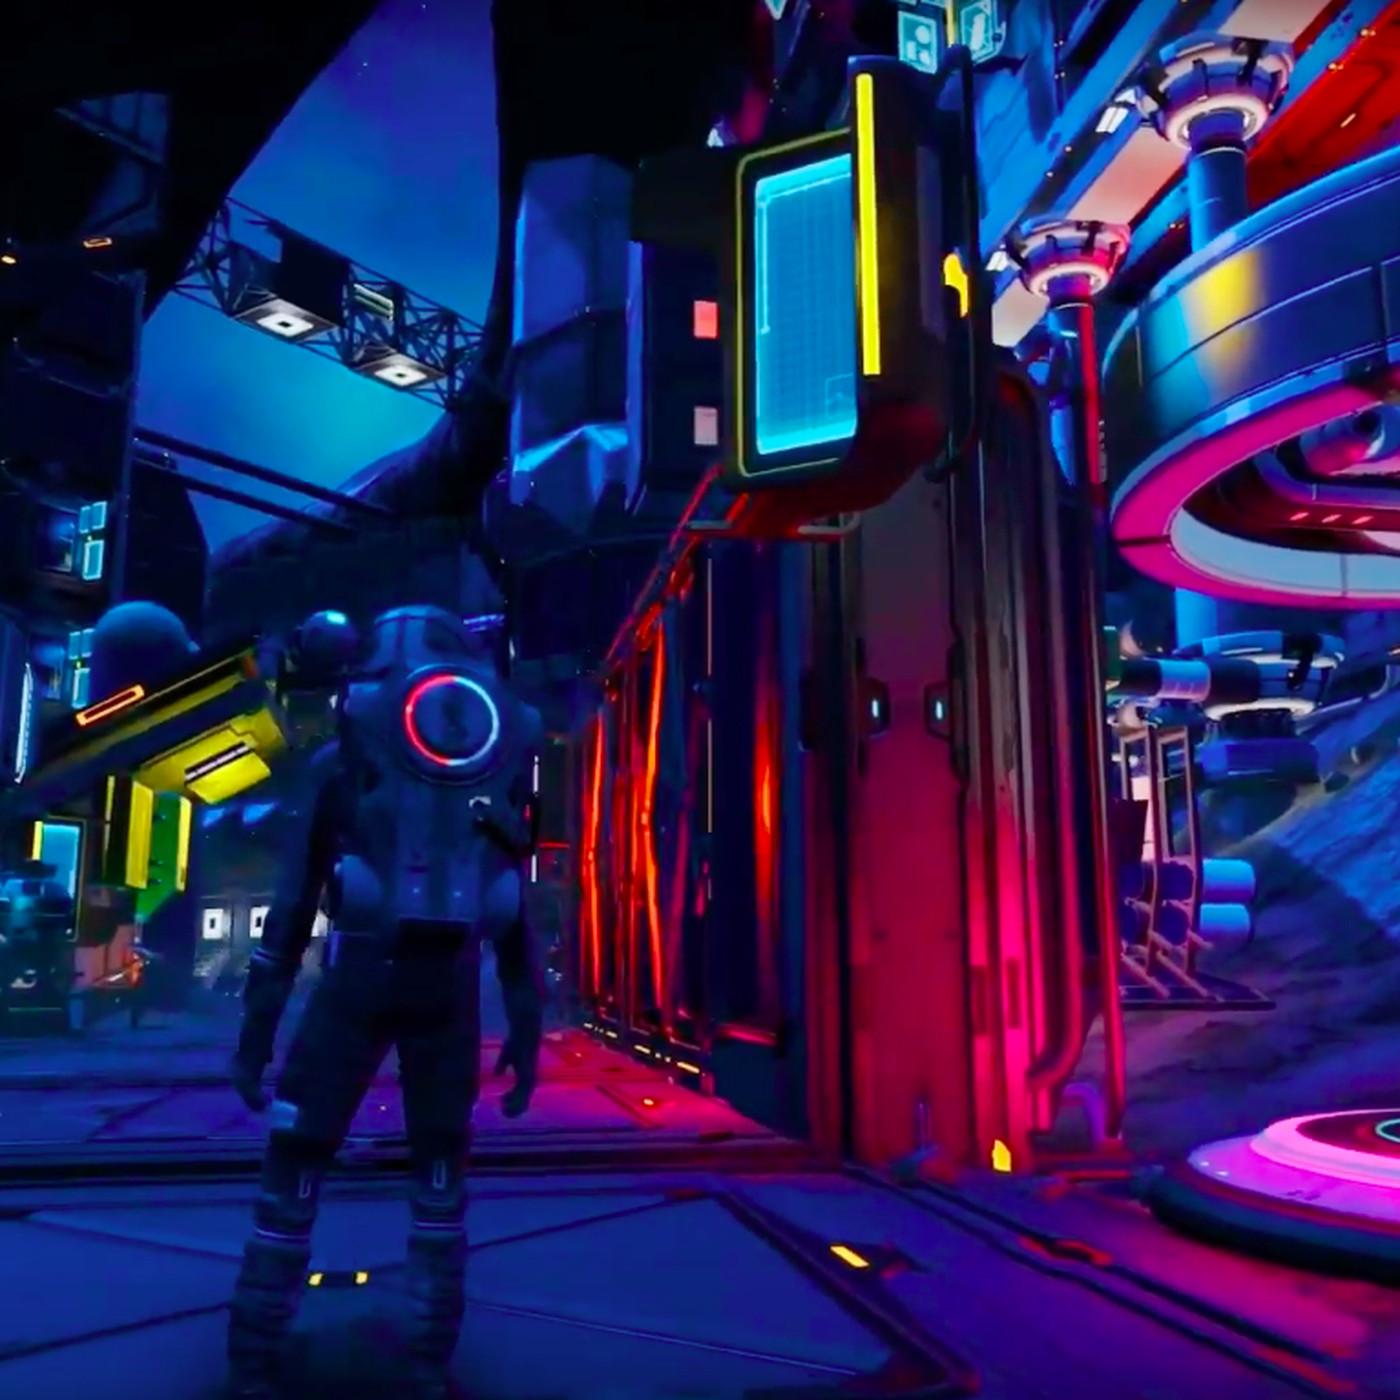 No Man's Sky players build wild cyberpunk city - Polygon on